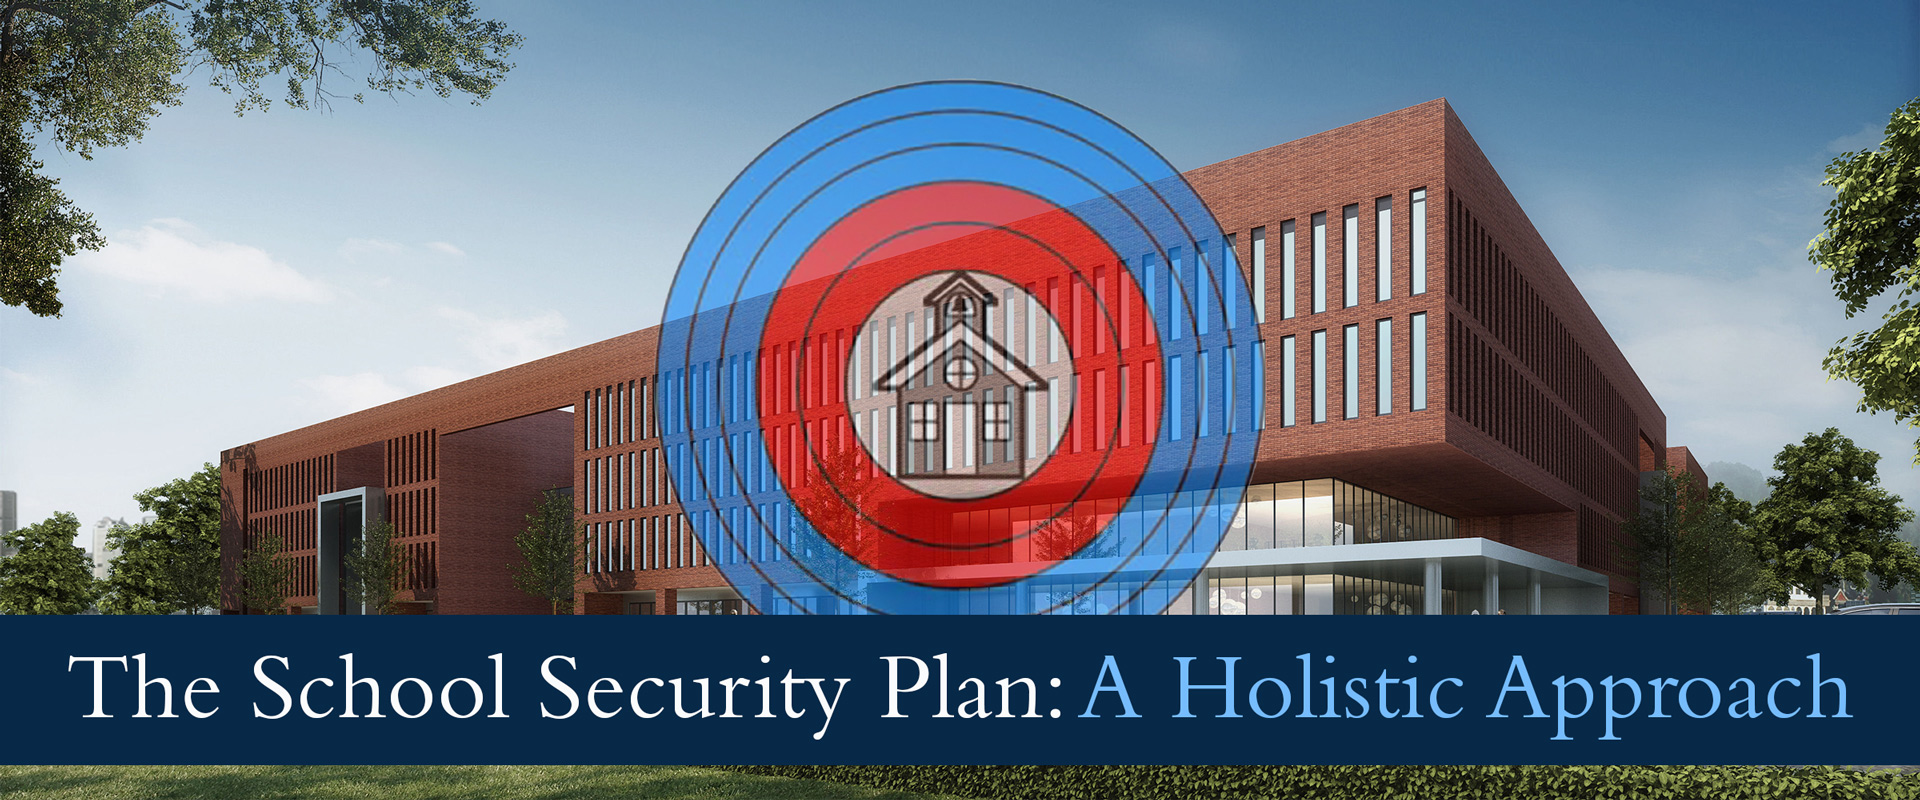 School Security Plan - A Holistic Approach